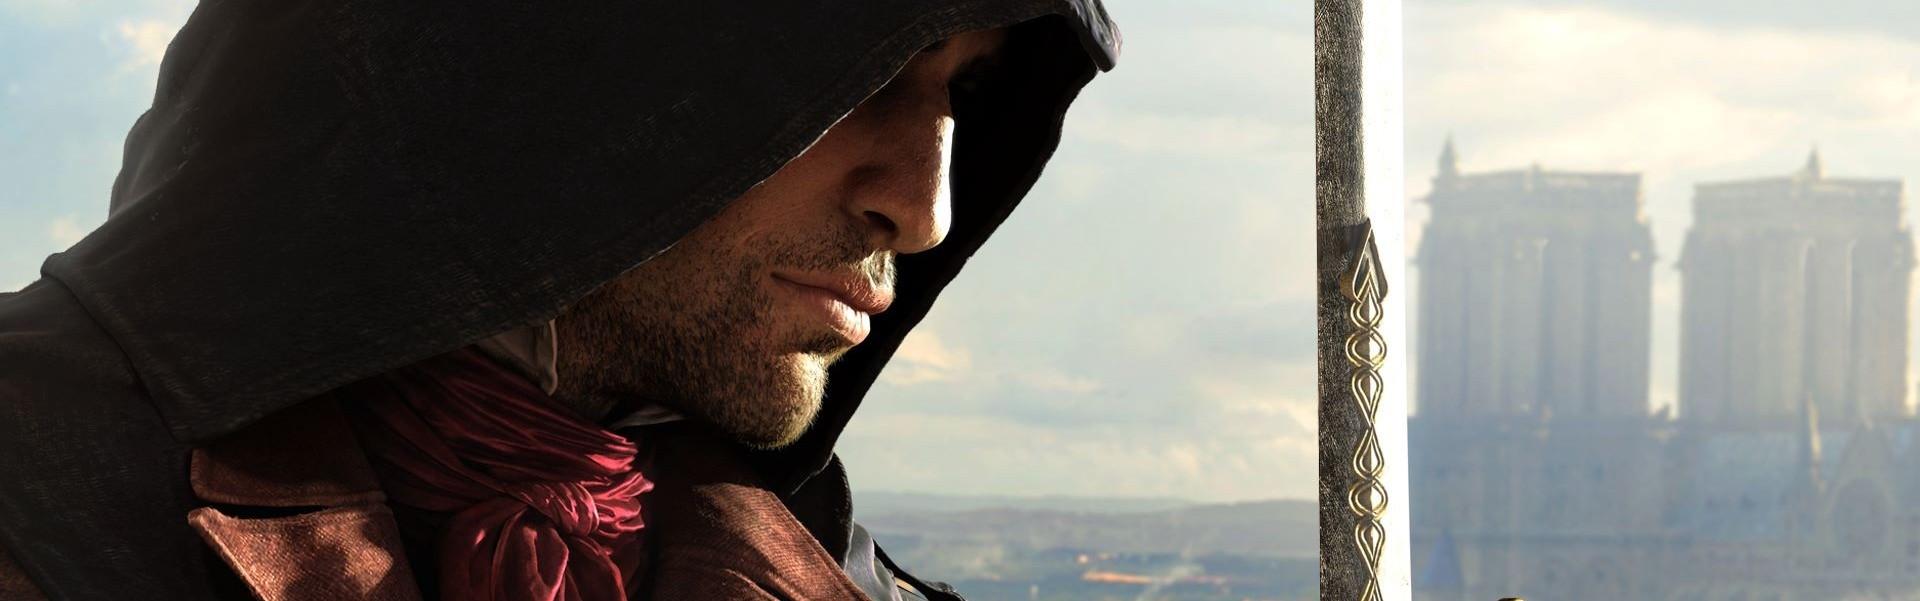 Assassin's Creed Brotherhood Uplay Key GLOBAL